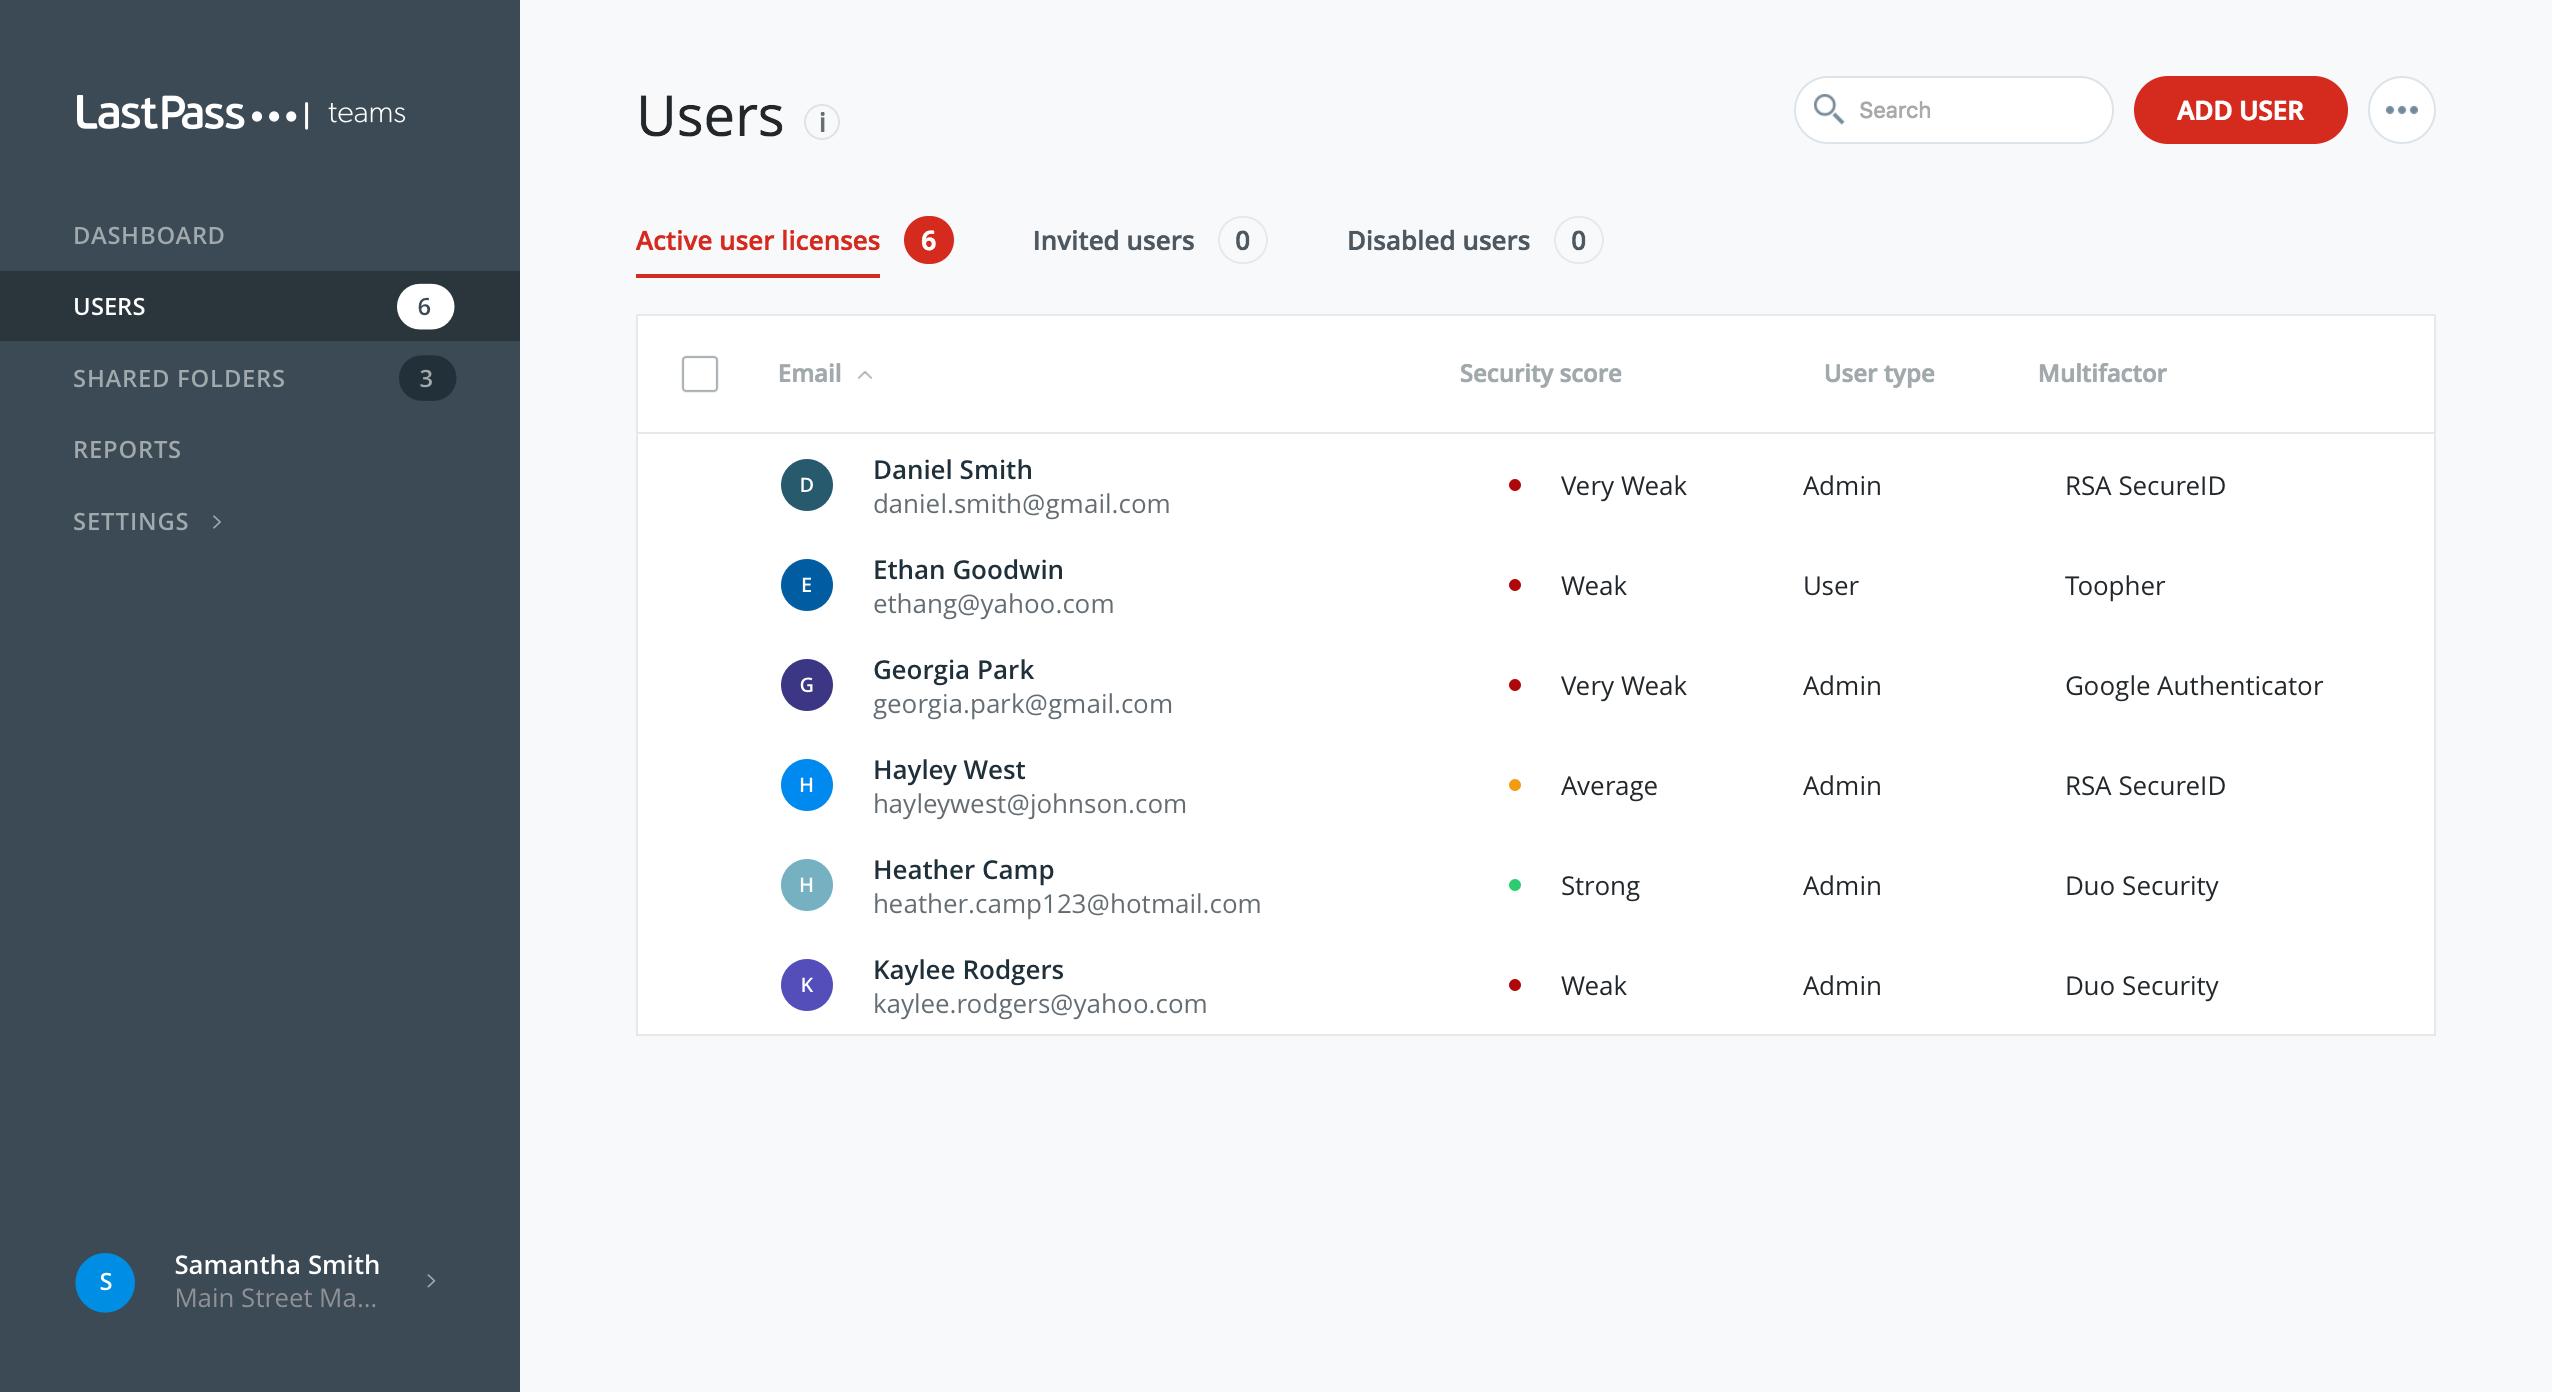 Active user licenses